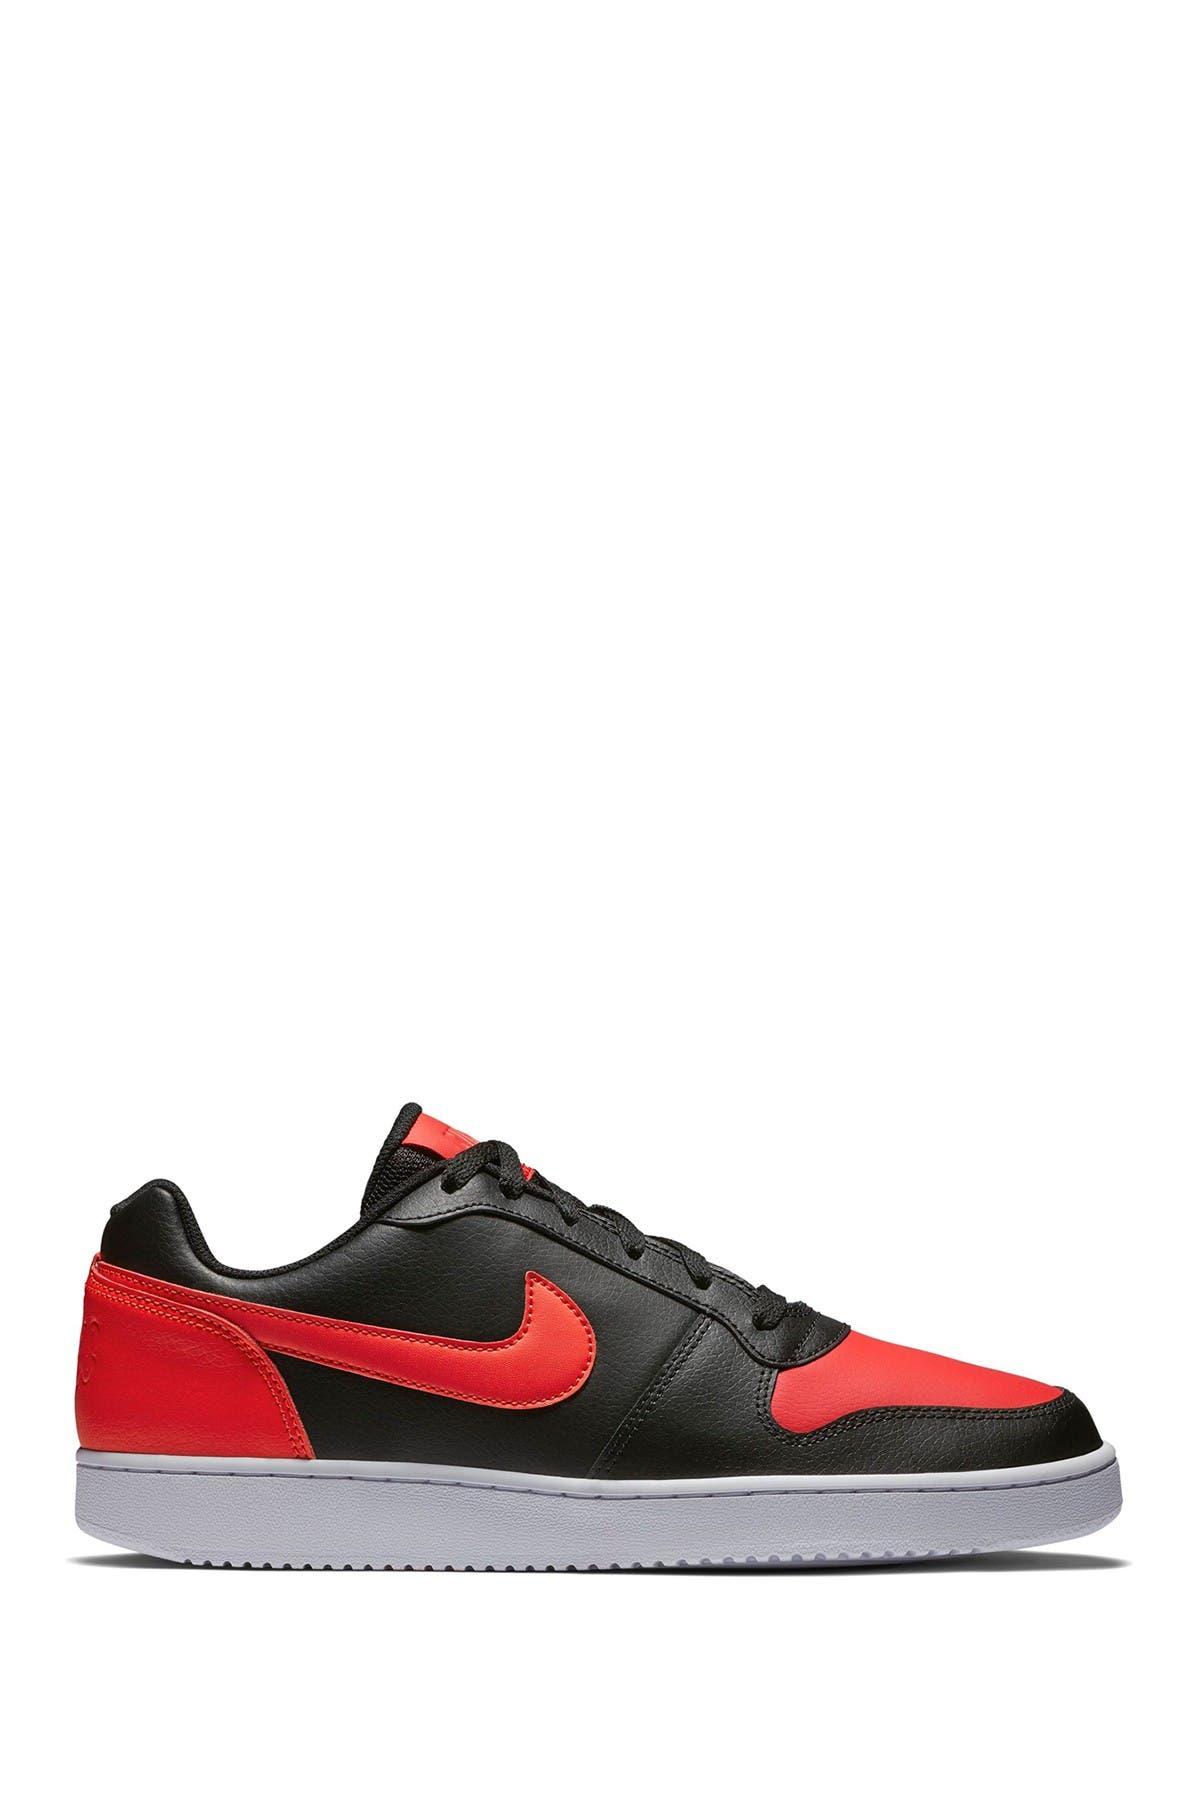 Nike | Ebernon Low Sneaker | Nordstrom Rack